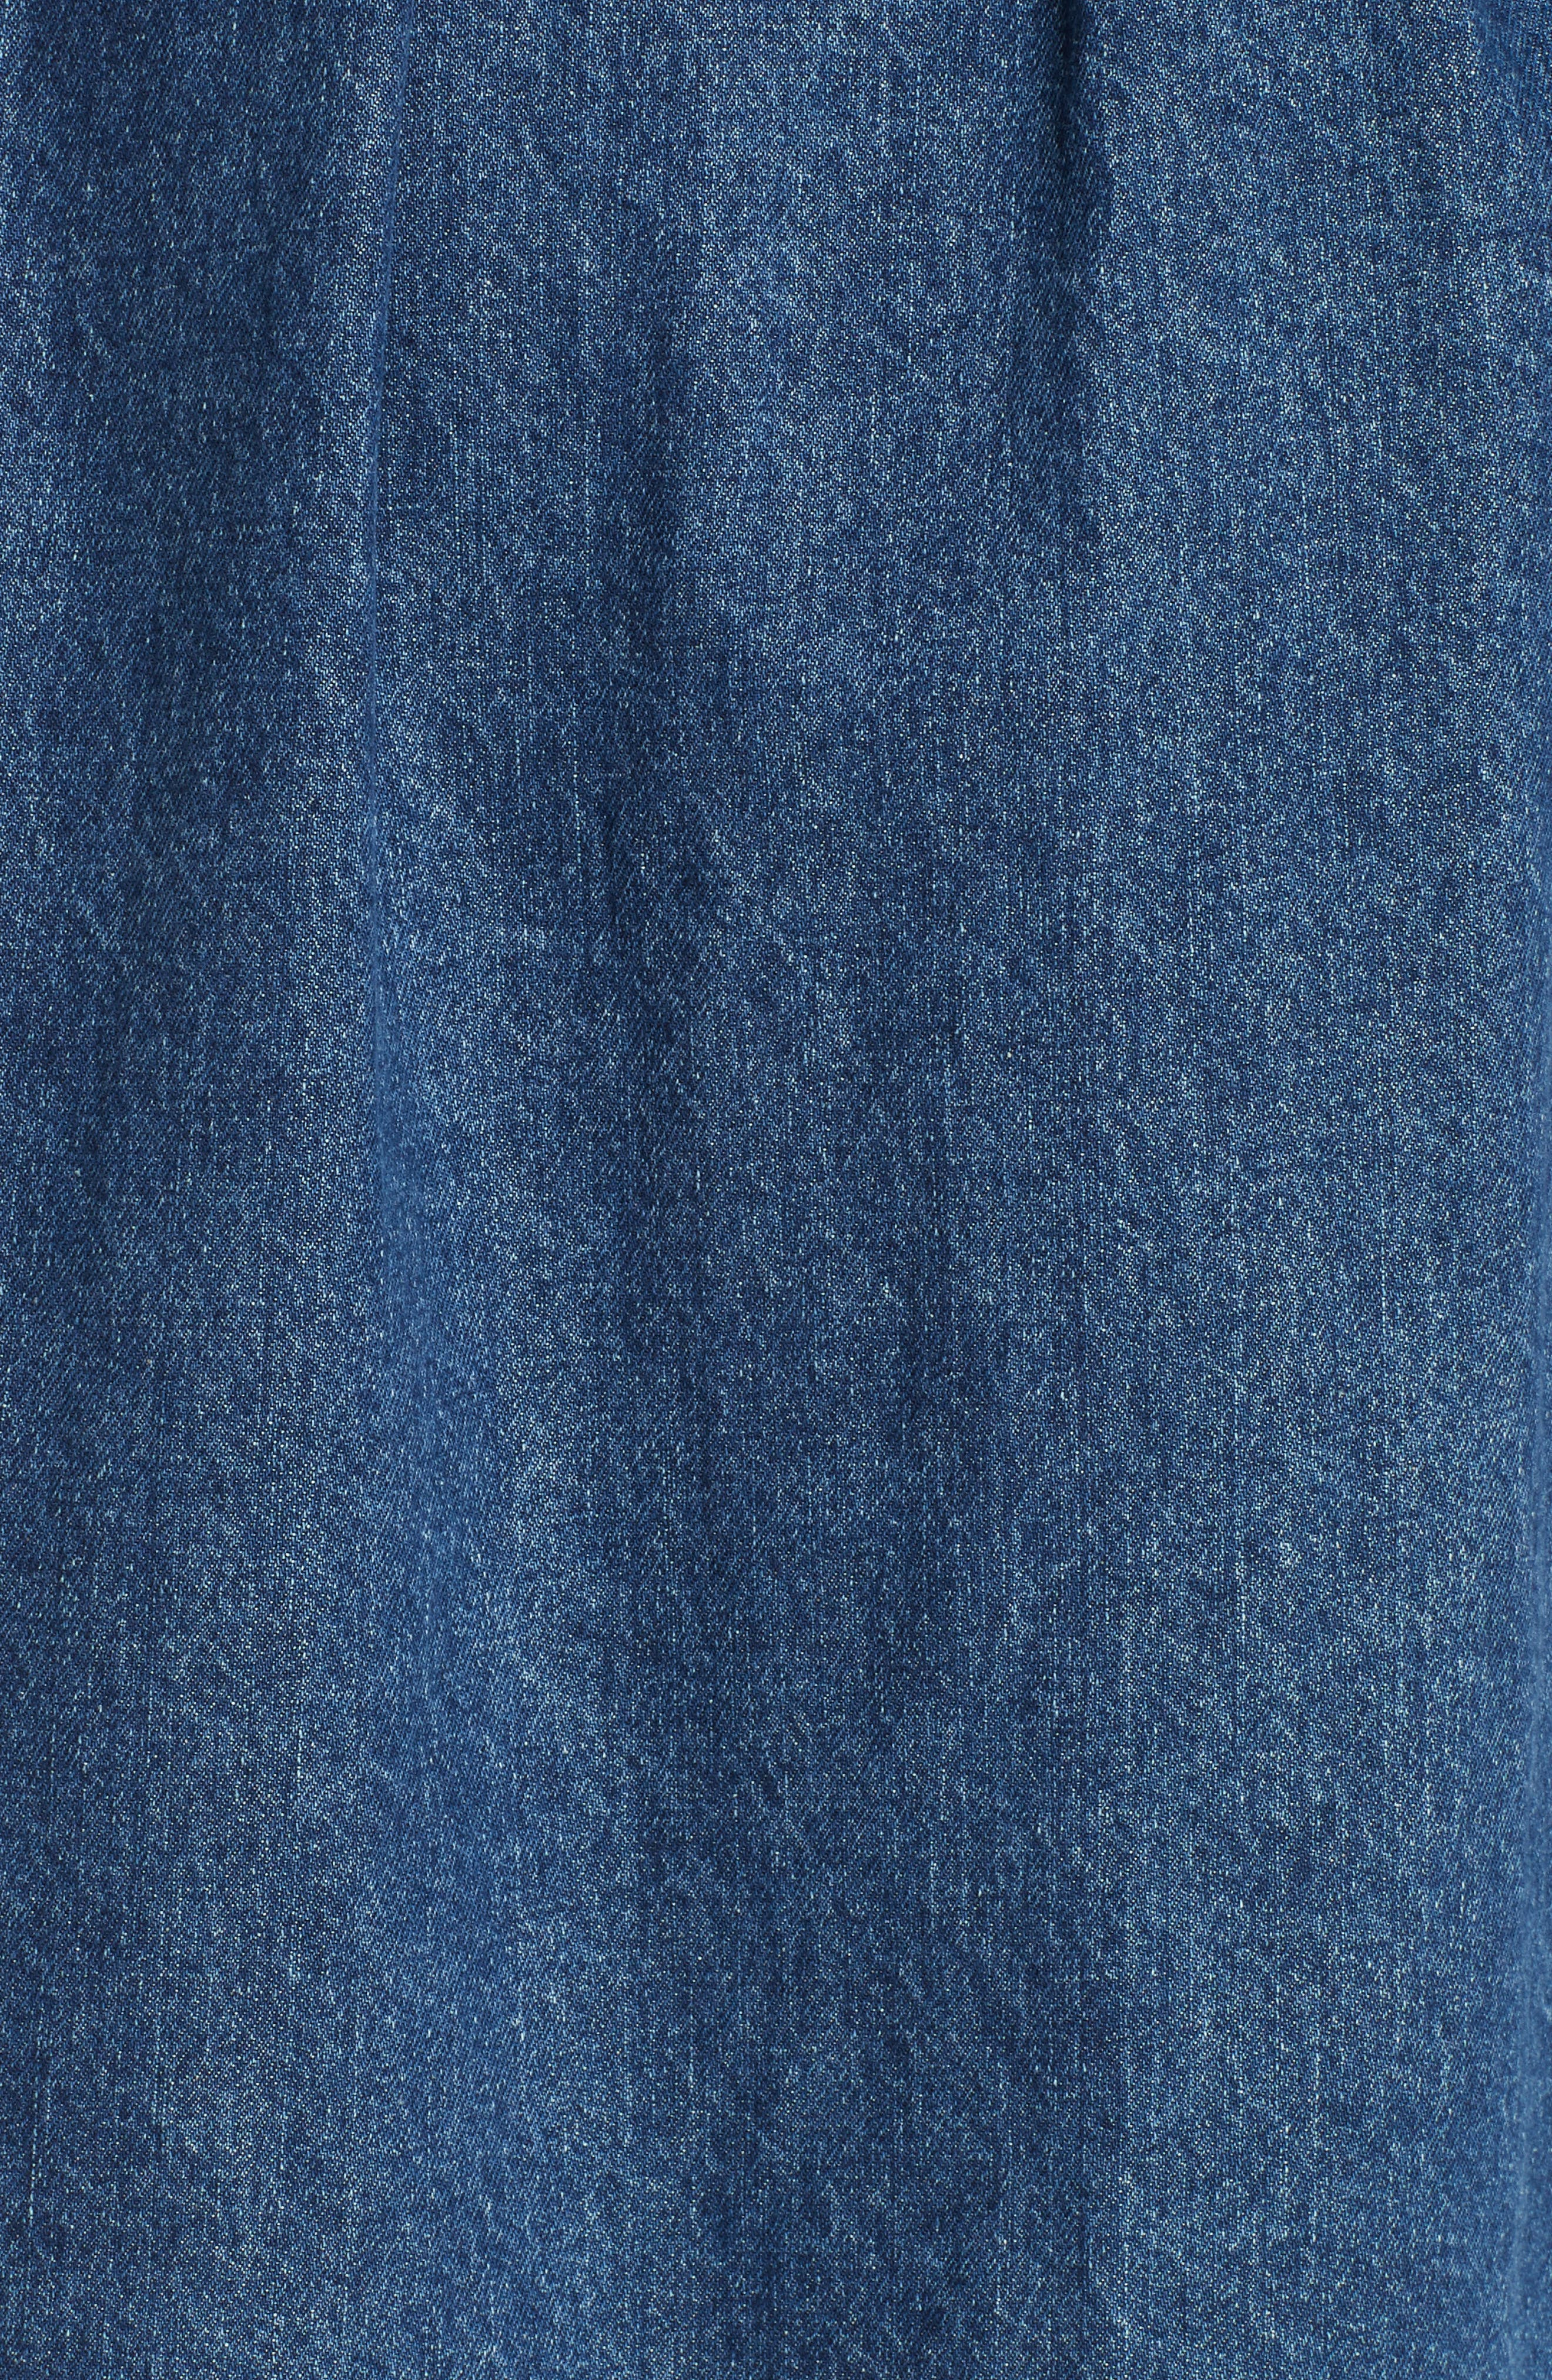 Denim A-Line Dress,                             Alternate thumbnail 6, color,                             INDIGO